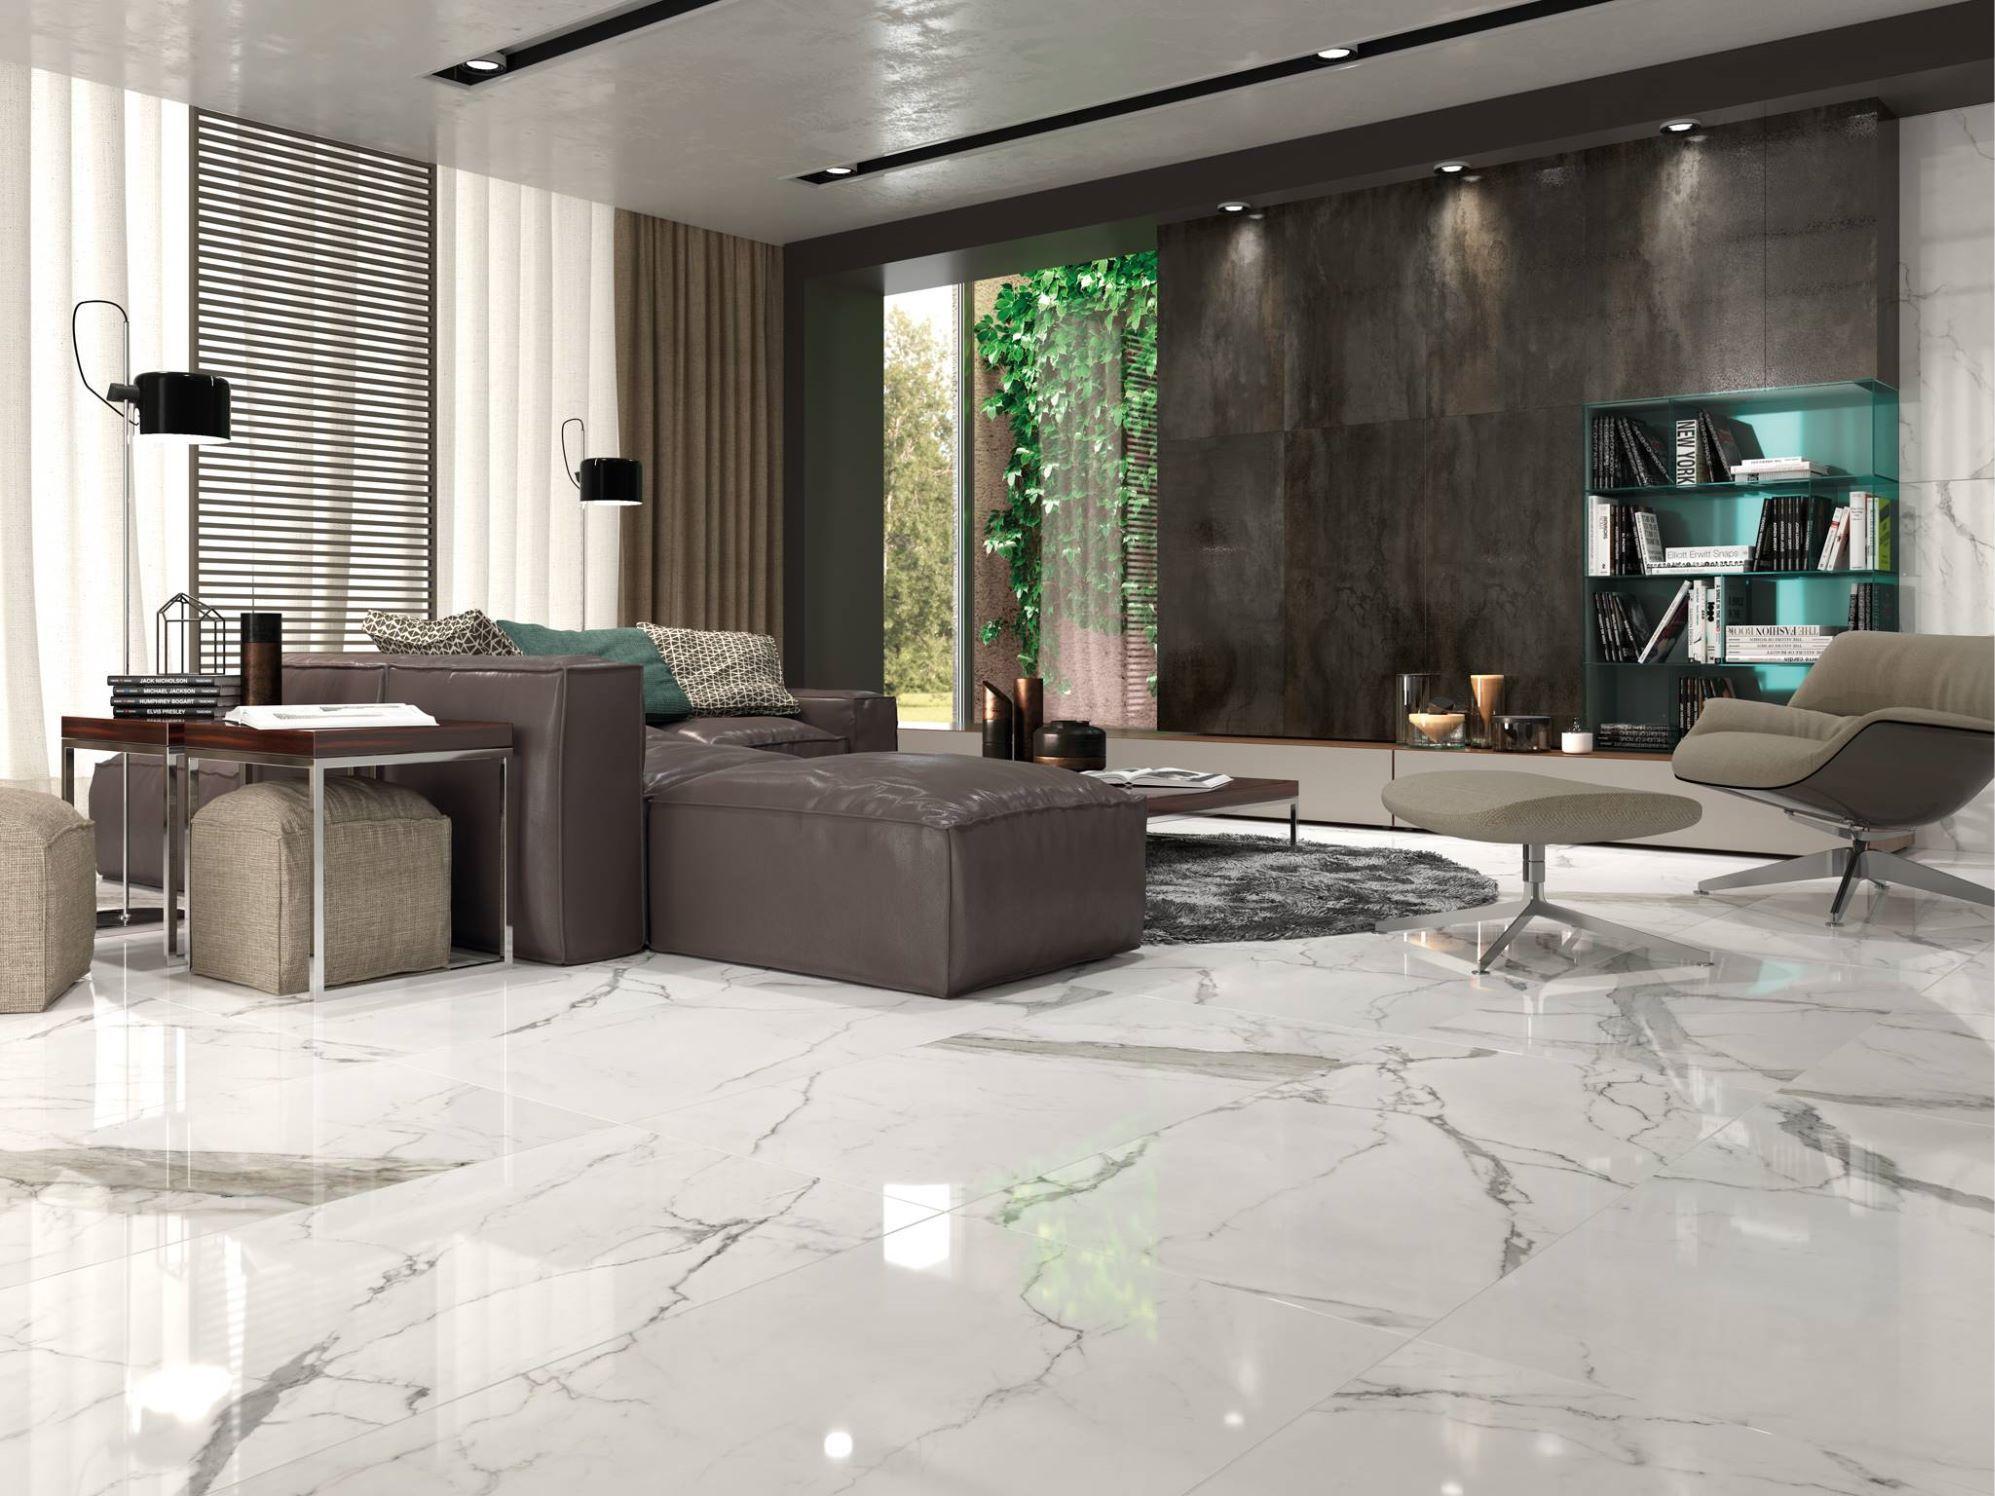 Statuario Cifre Cer 225 Mica Marbre Living Room Flooring